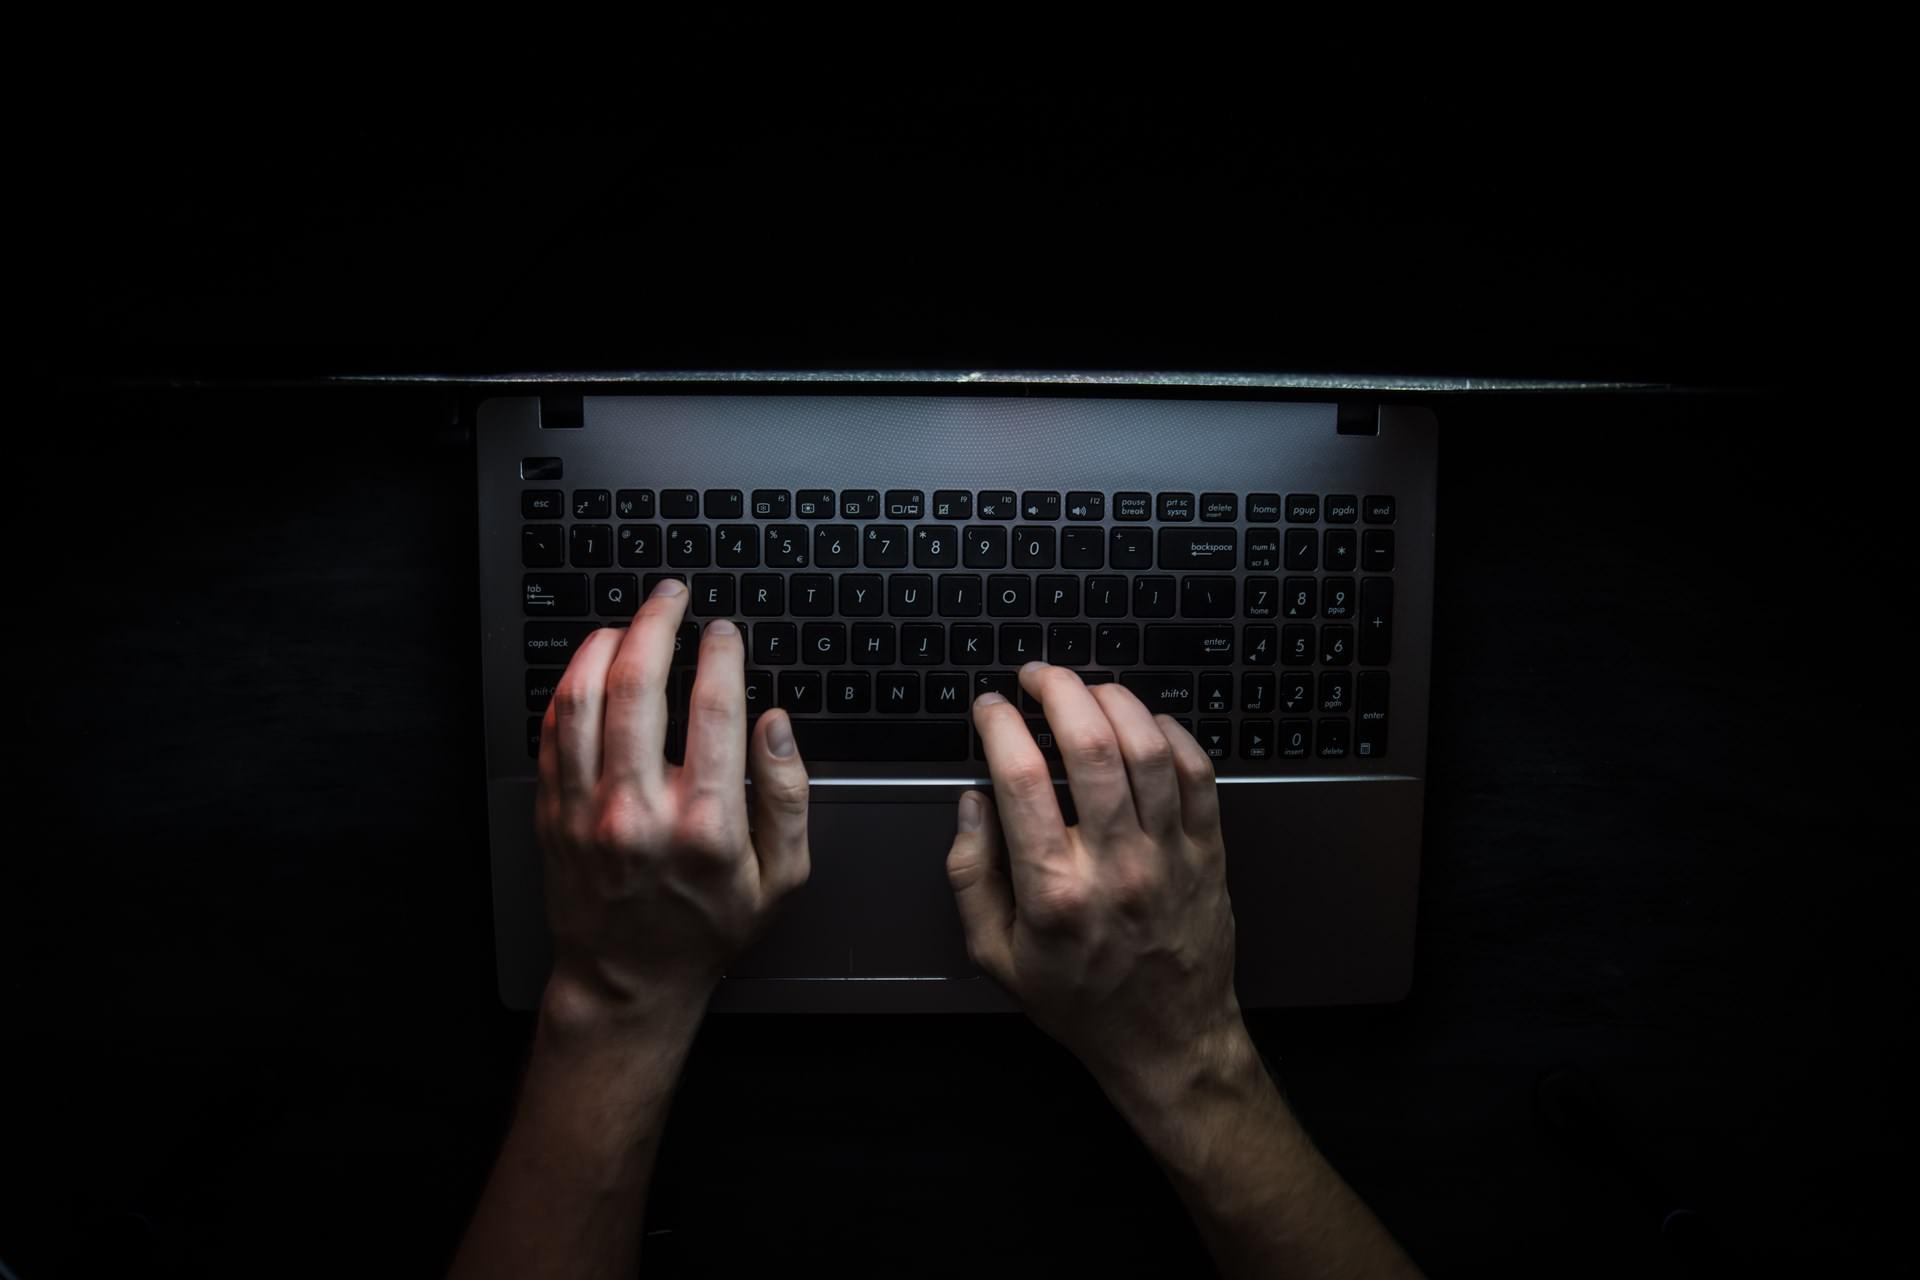 Oι πωλήσεις ναρκωτικών στο dark net αυξάνονται δραματικά στην Αγγλία